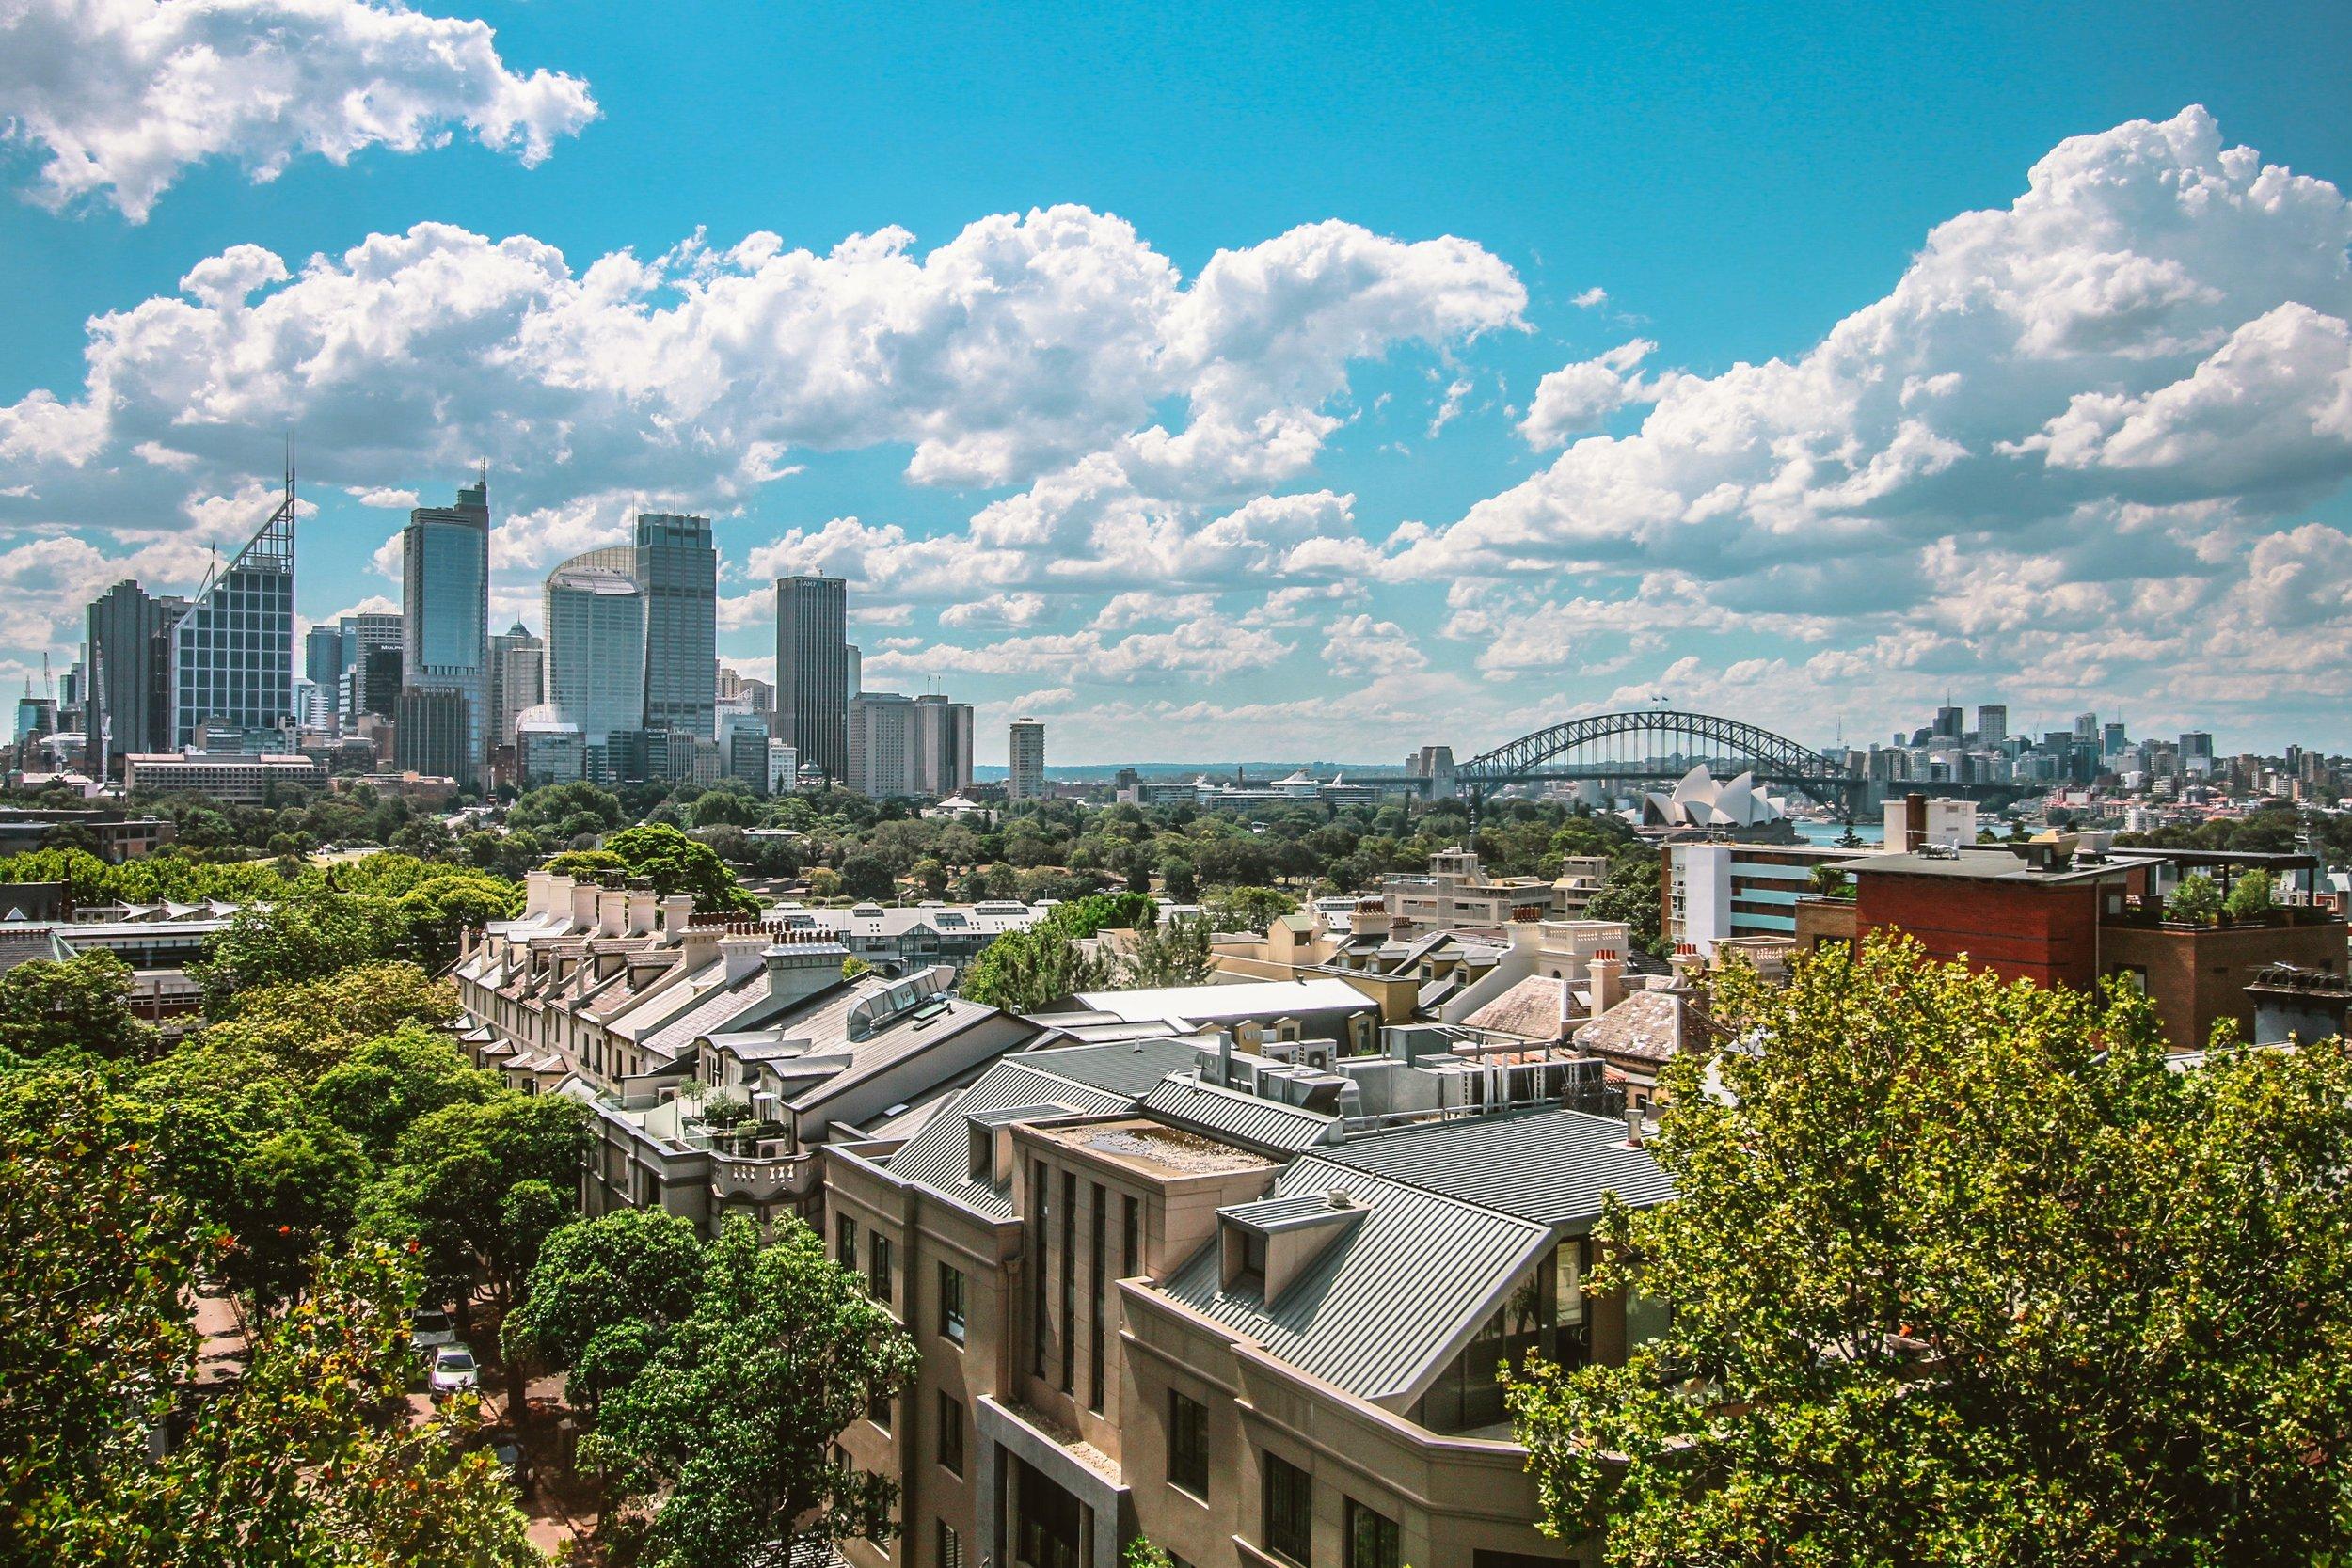 architecture-australia-bridge-783682.jpg